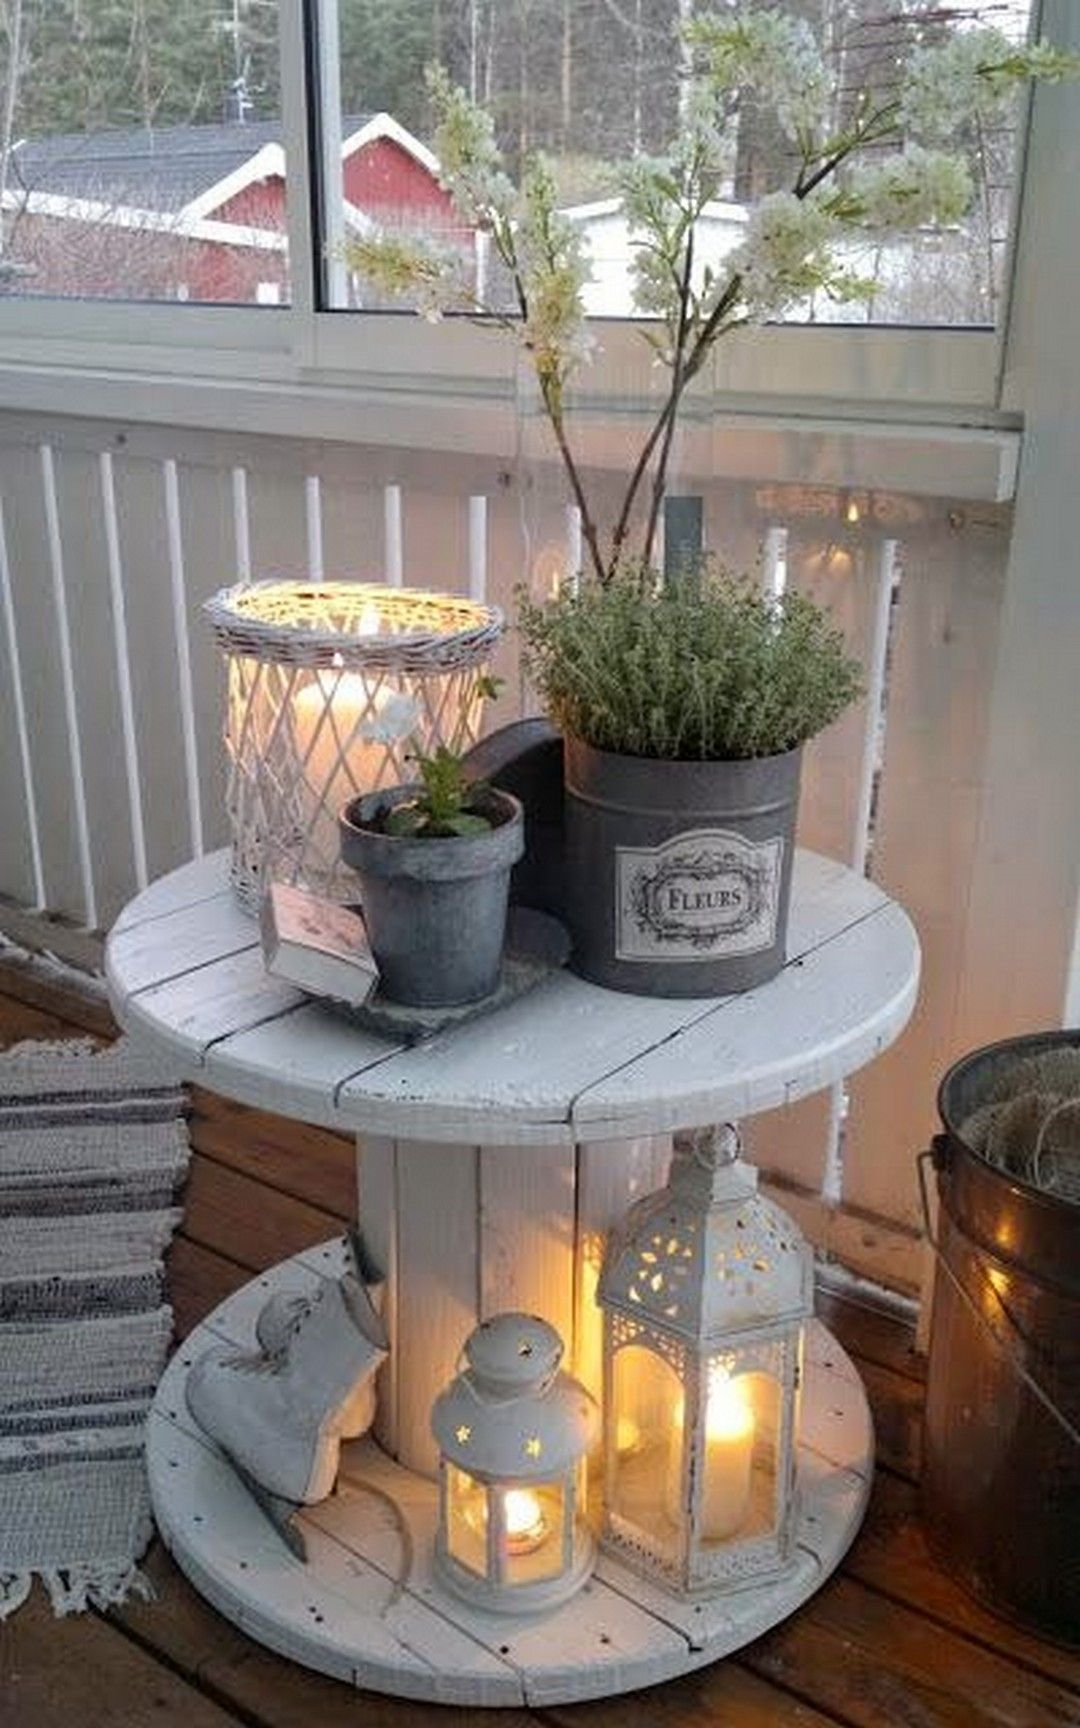 54 Gorgeous Rustic Farmhouse Porch Design Ideas Onechitecture 2017 10 17